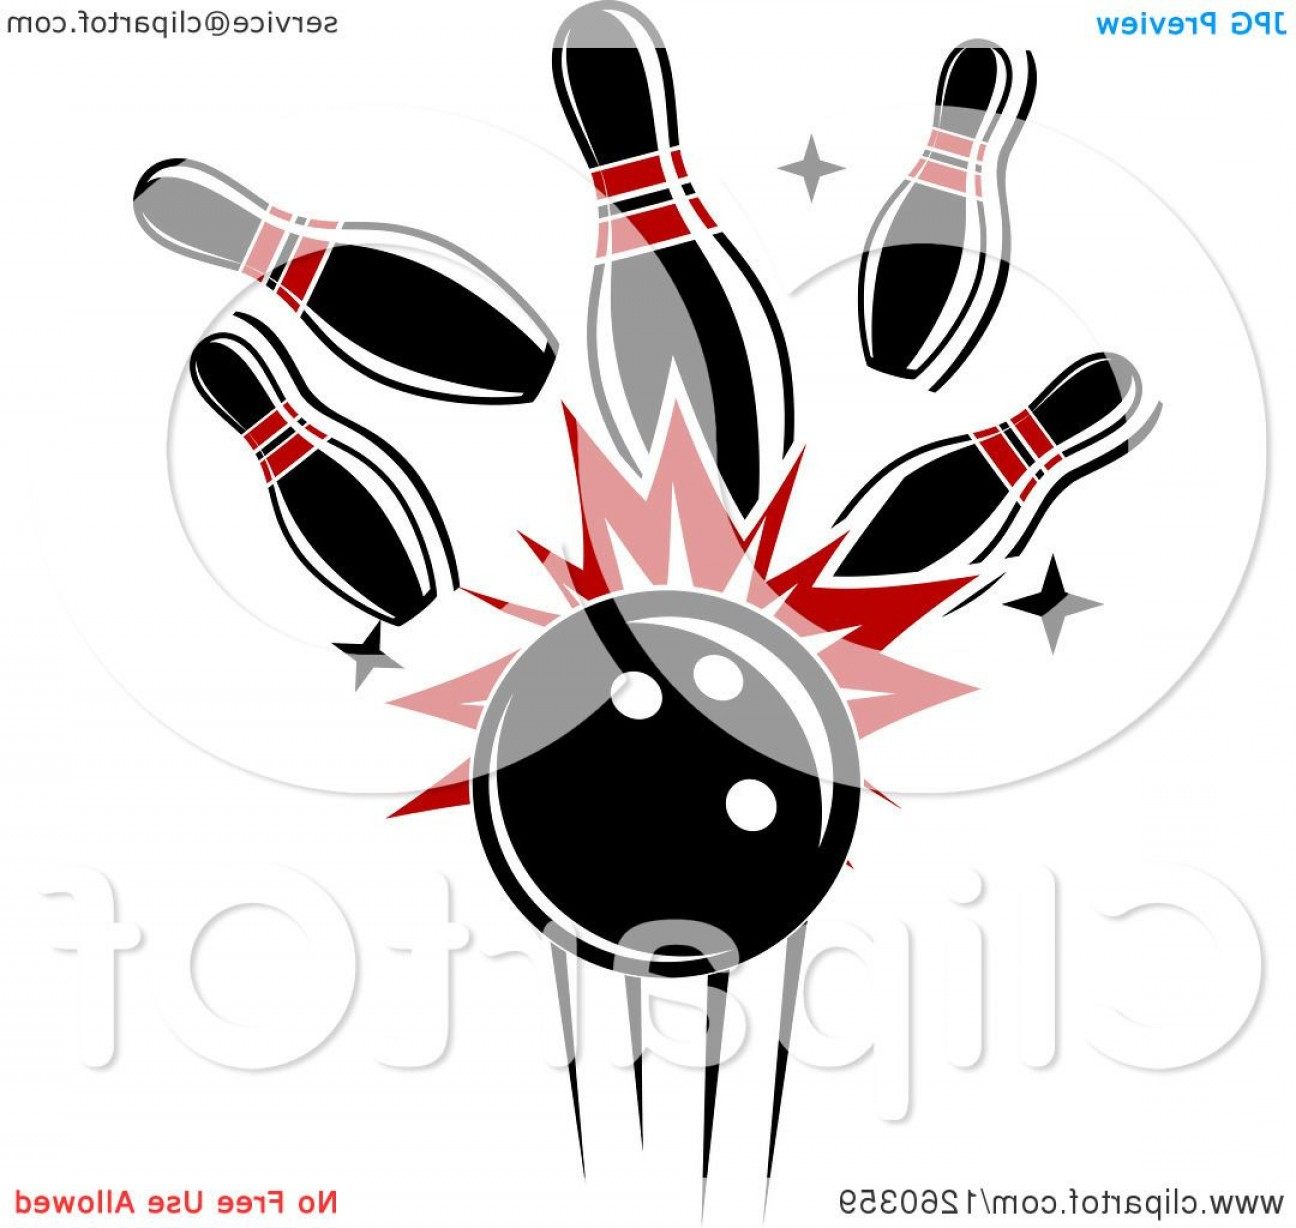 1296x1228 Bowling Ball Crashing Into Pins Arenawp